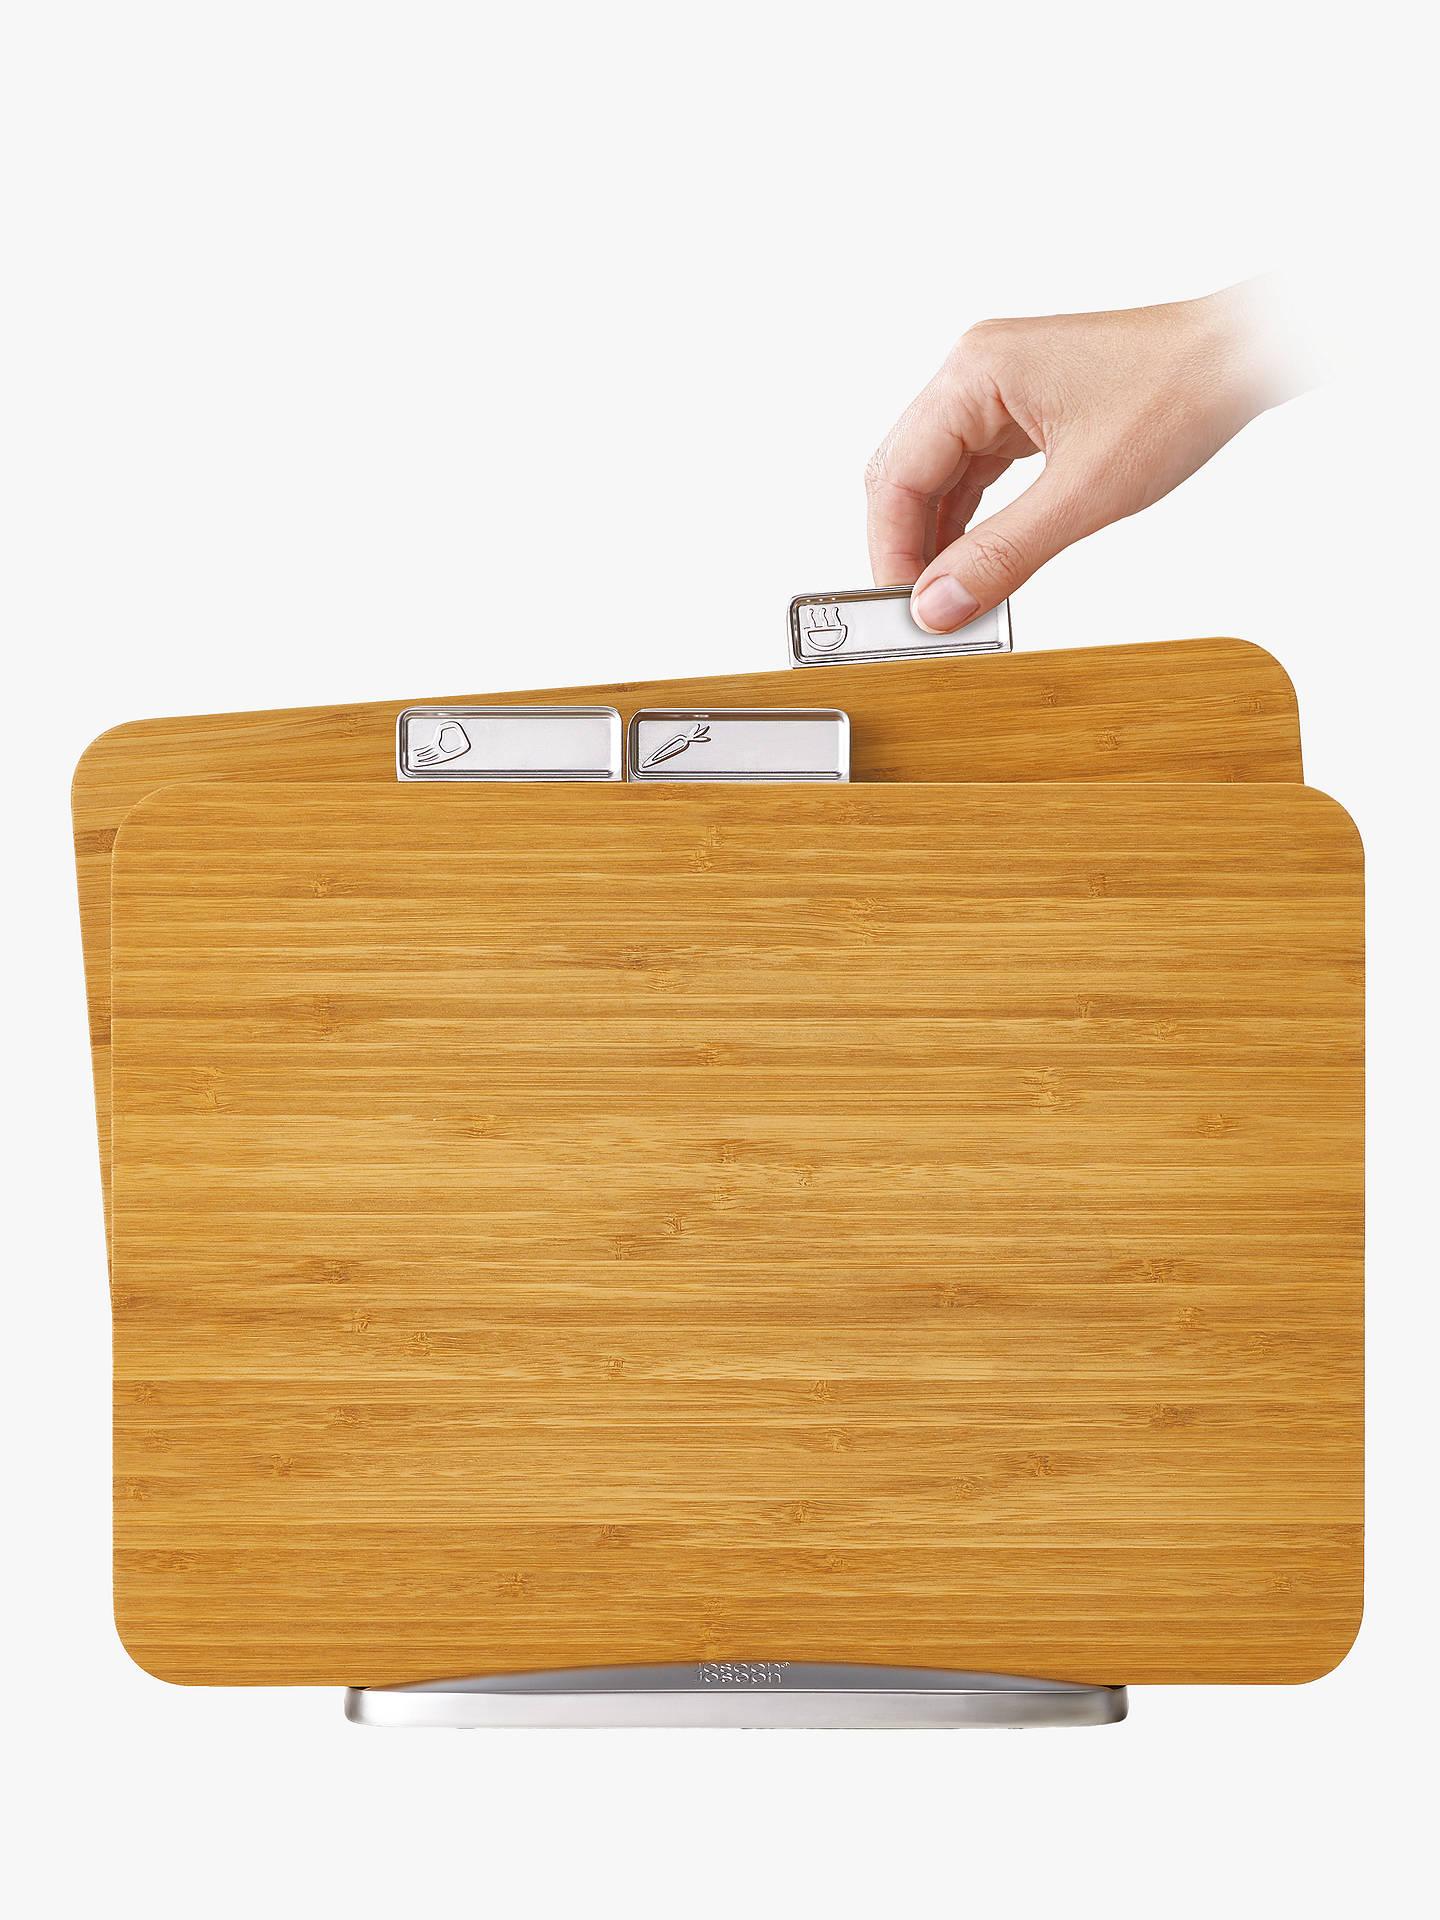 joseph joseph bamboo index chopping board set natural at. Black Bedroom Furniture Sets. Home Design Ideas